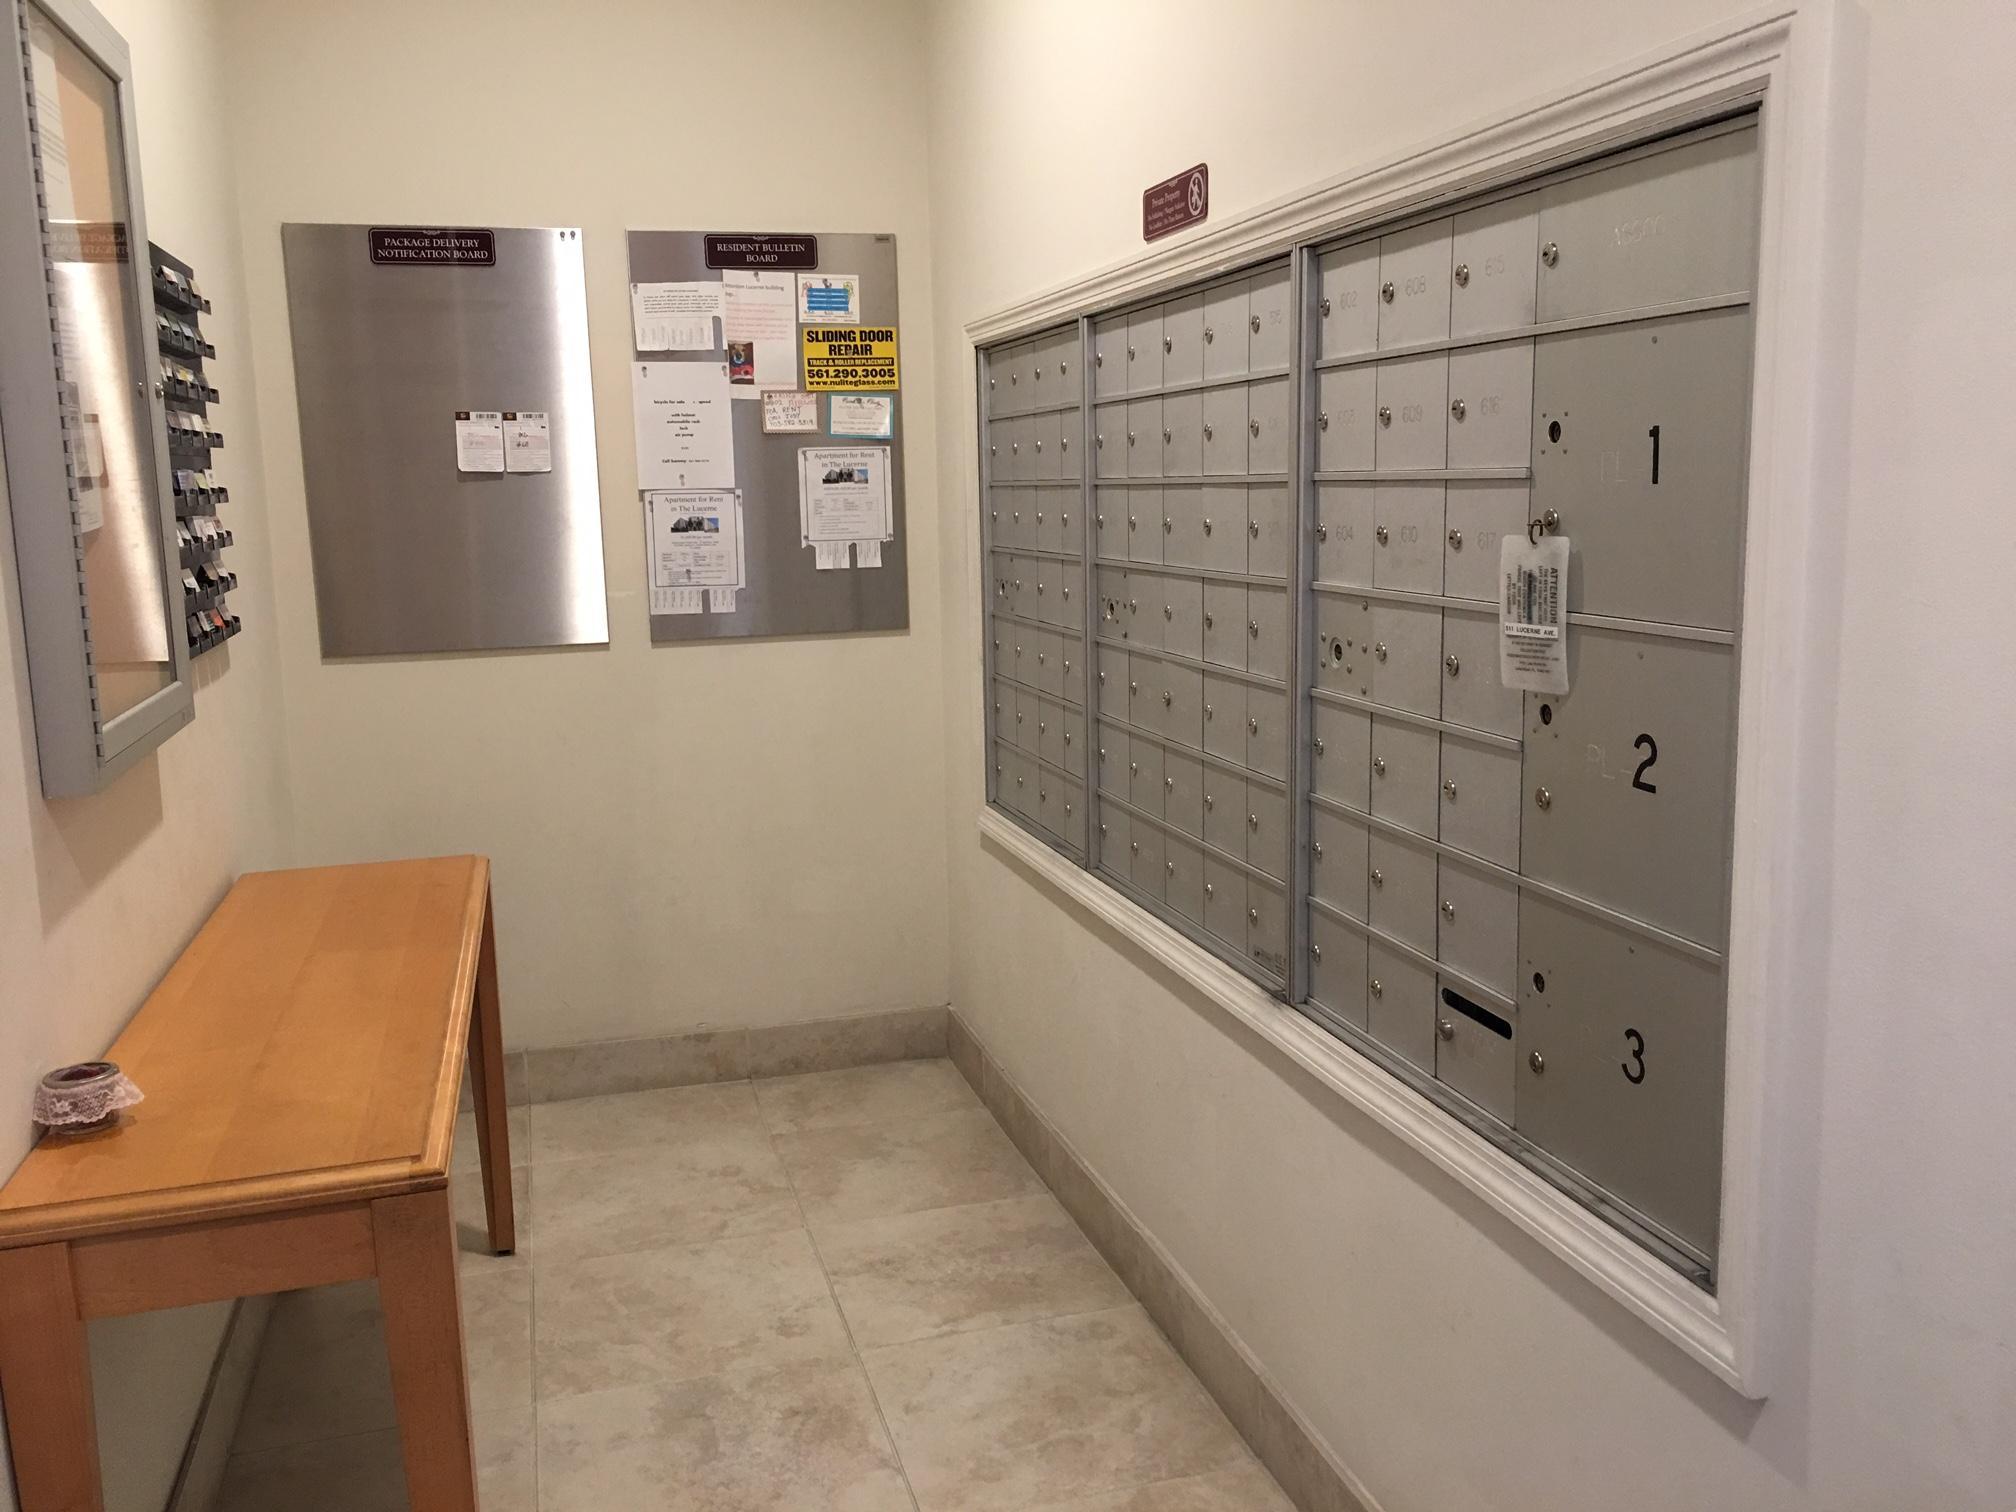 The Lucerne mail room